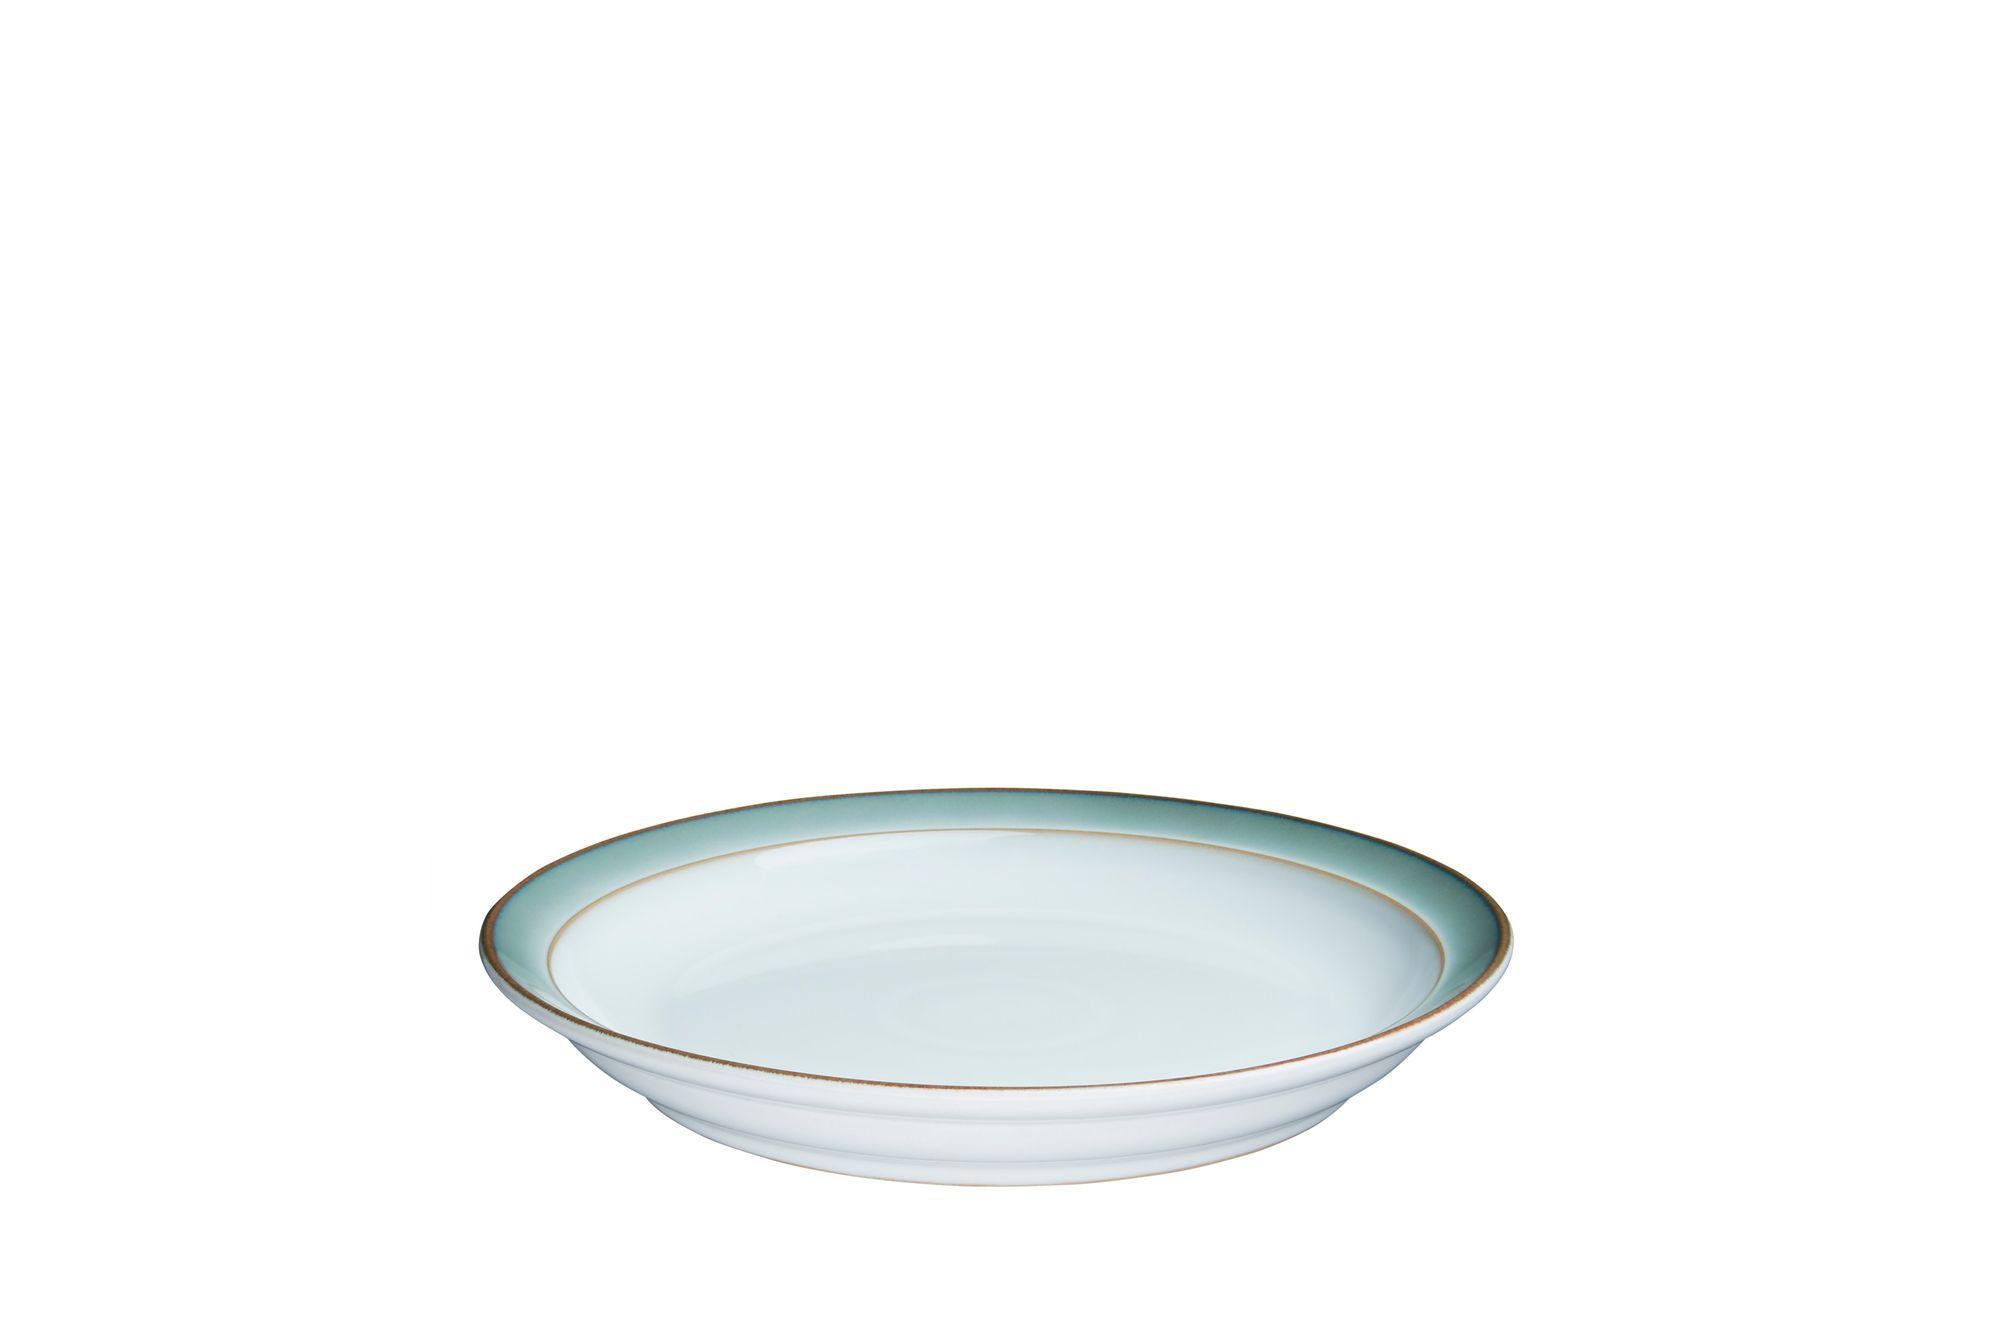 Denby Regency Green Tea Plate Deep Plate 18.5 x 3cm thumb 1